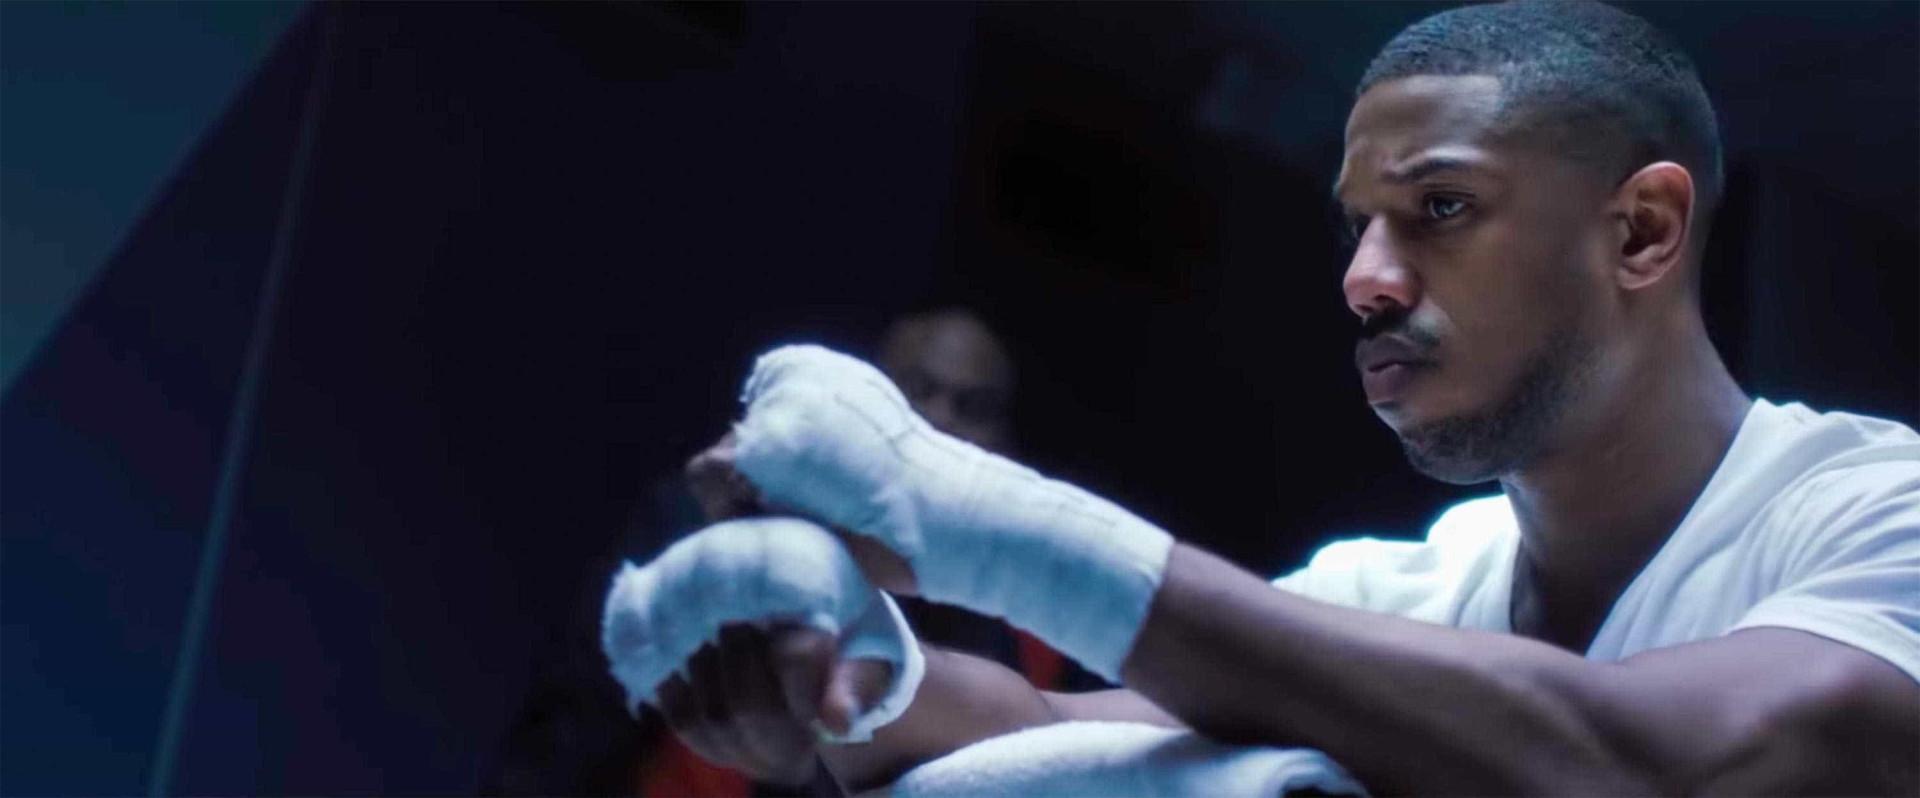 Michael B. Jordan e Stallone mantêm parceria em trailer de 'Creed II'